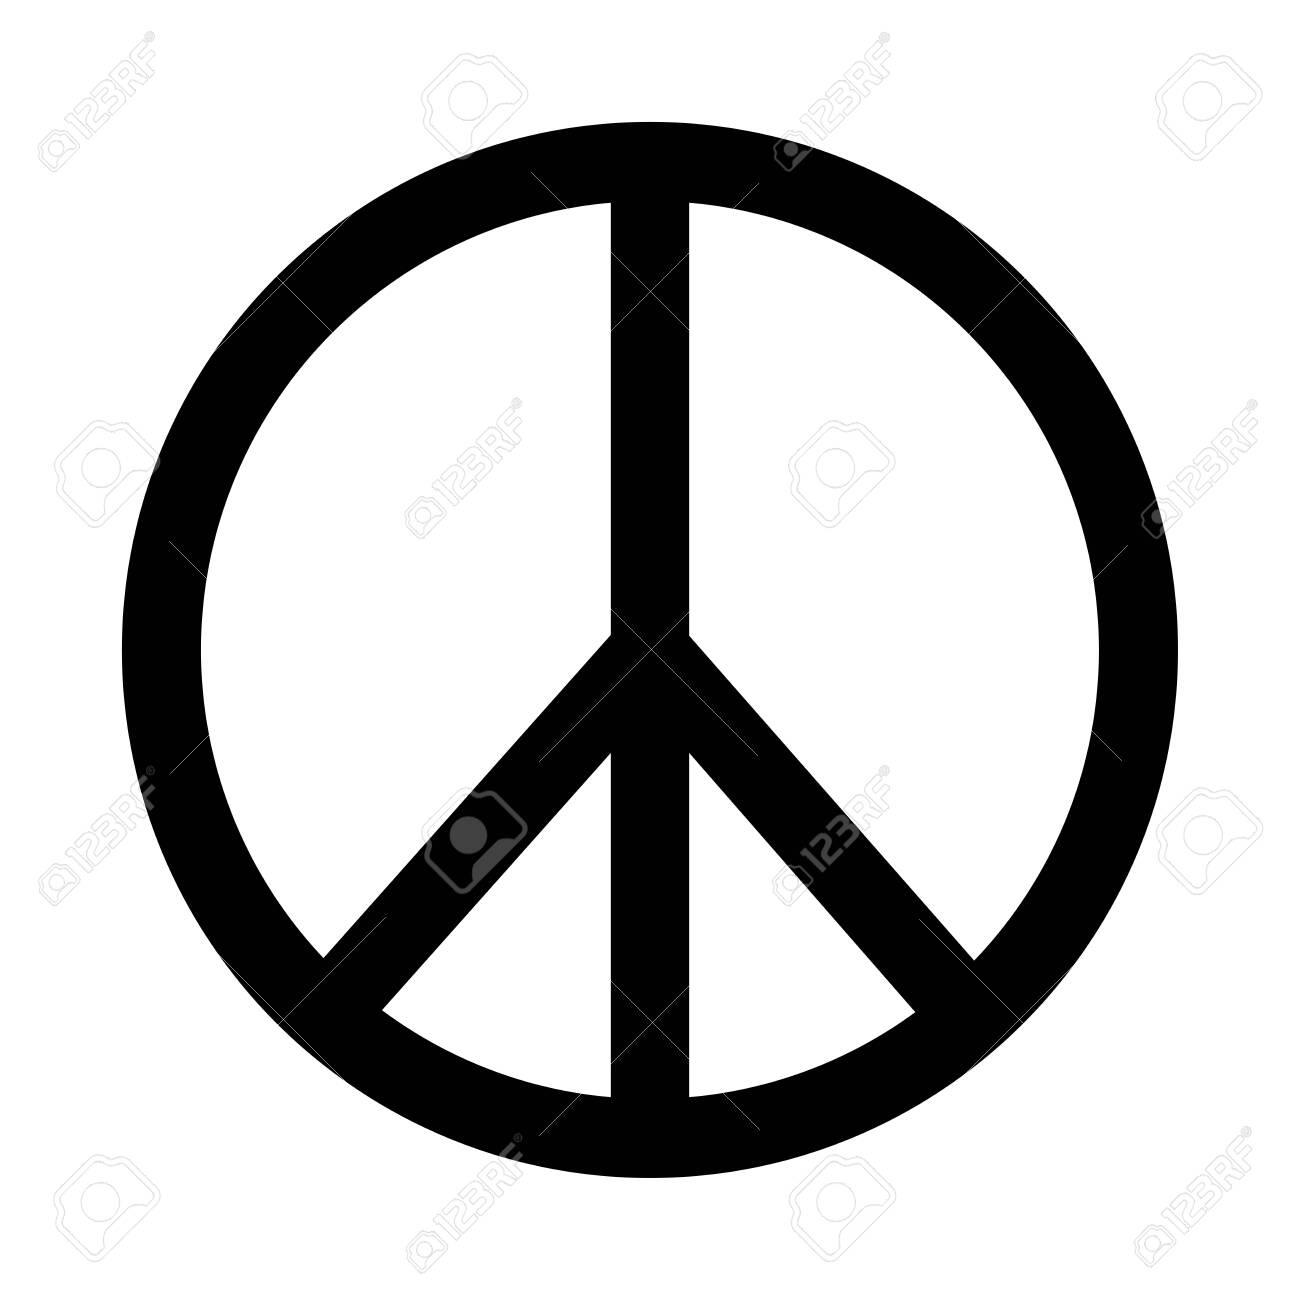 Peace Sign Logo icon. Black and white illustration. - 150279414